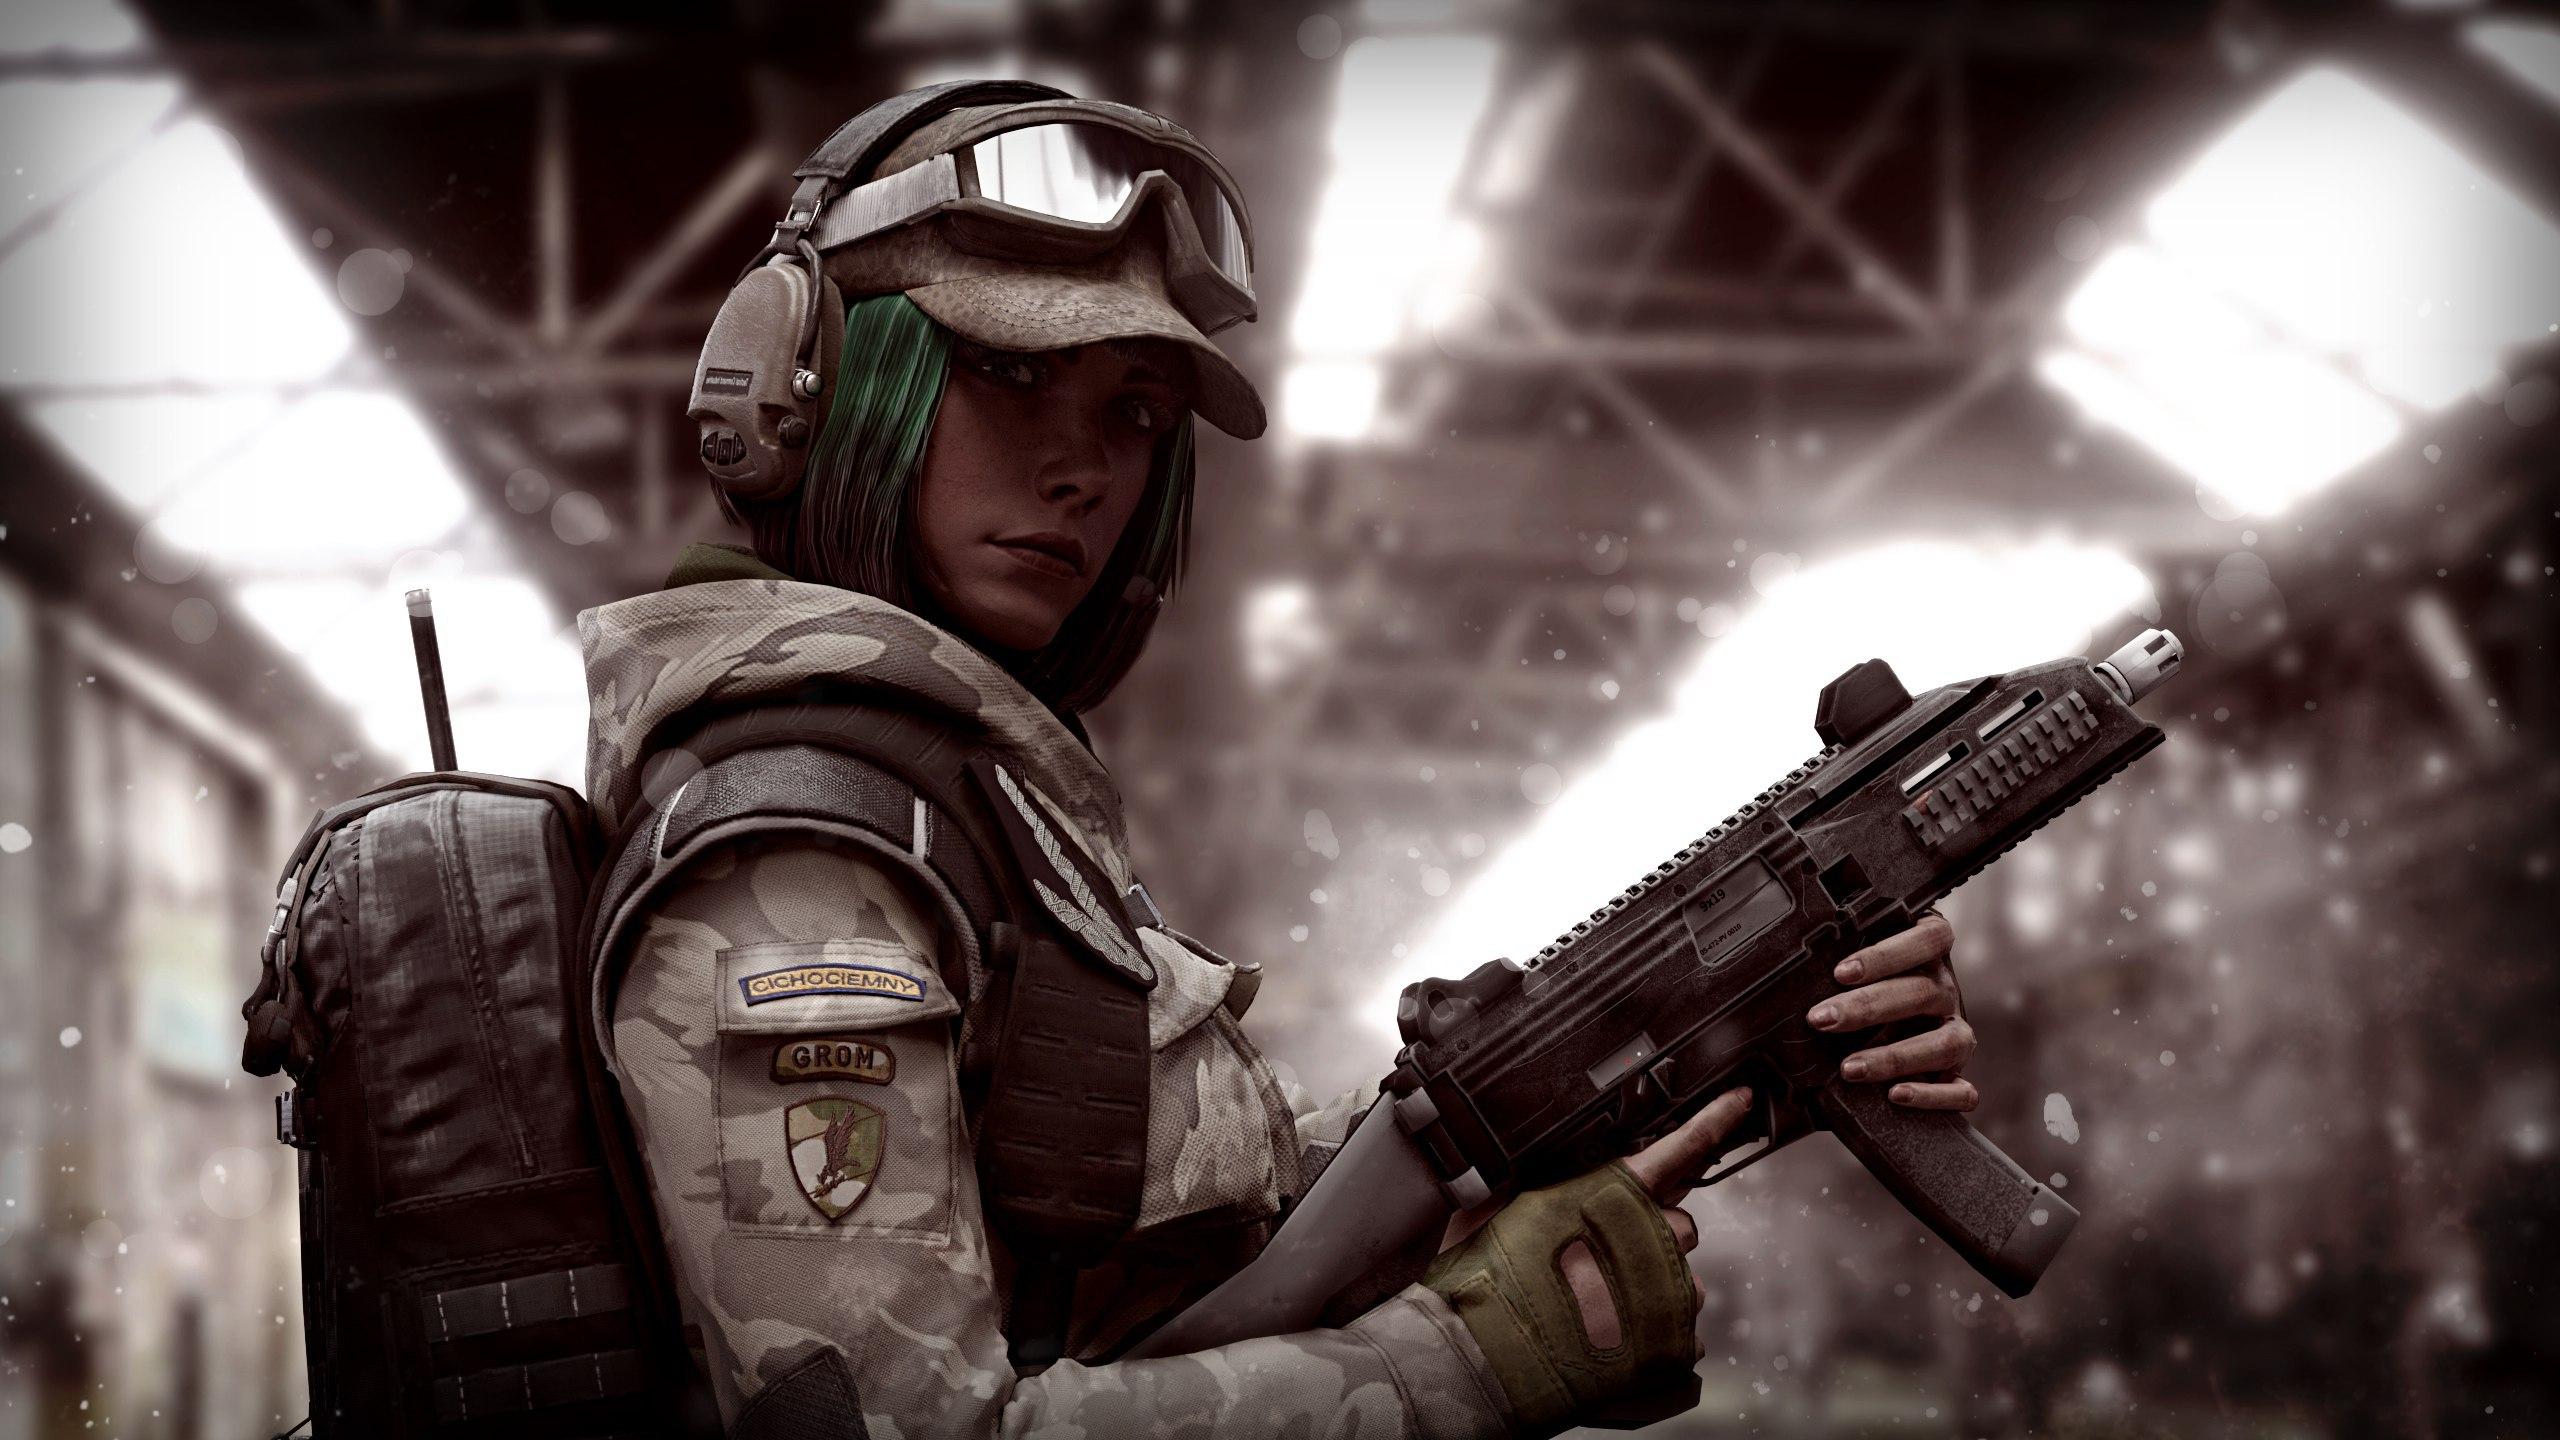 Tom Clancy's Rainbow Six: Siege HD Duvar kağıdı | Arka plan | 2560x1440 |  ID:906767 - Wallpaper Abyss